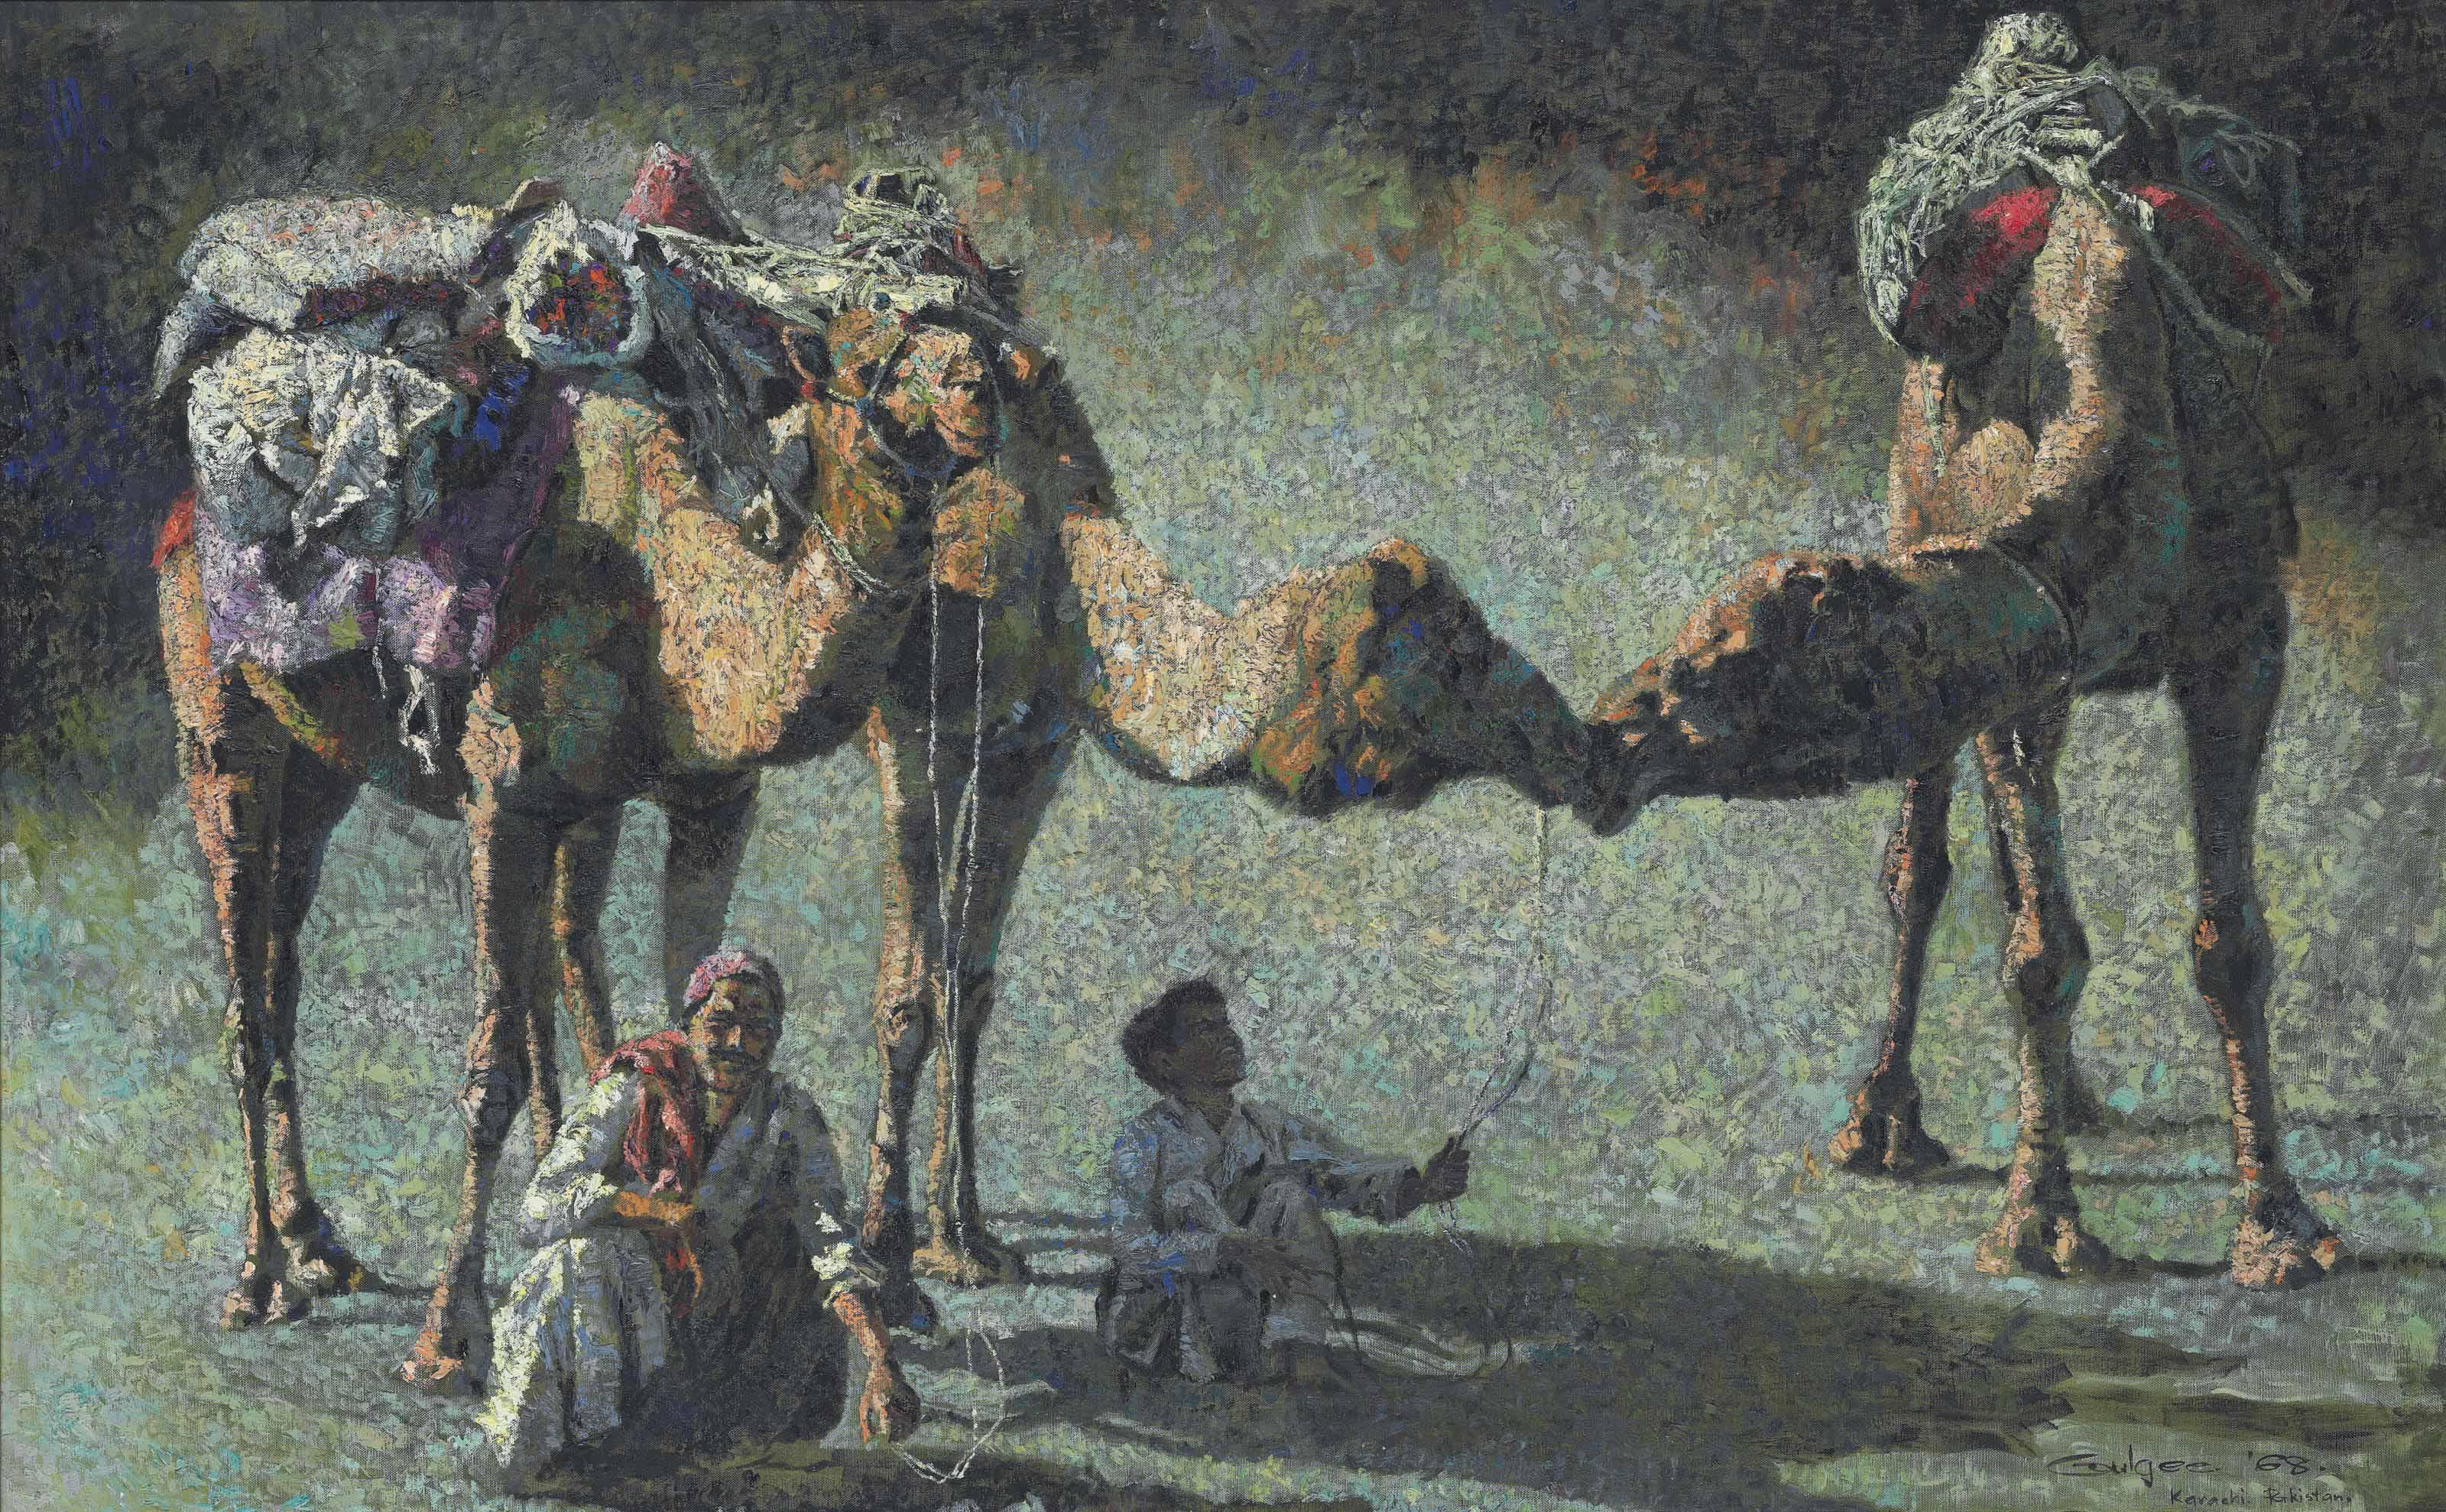 Untitled (Camels)